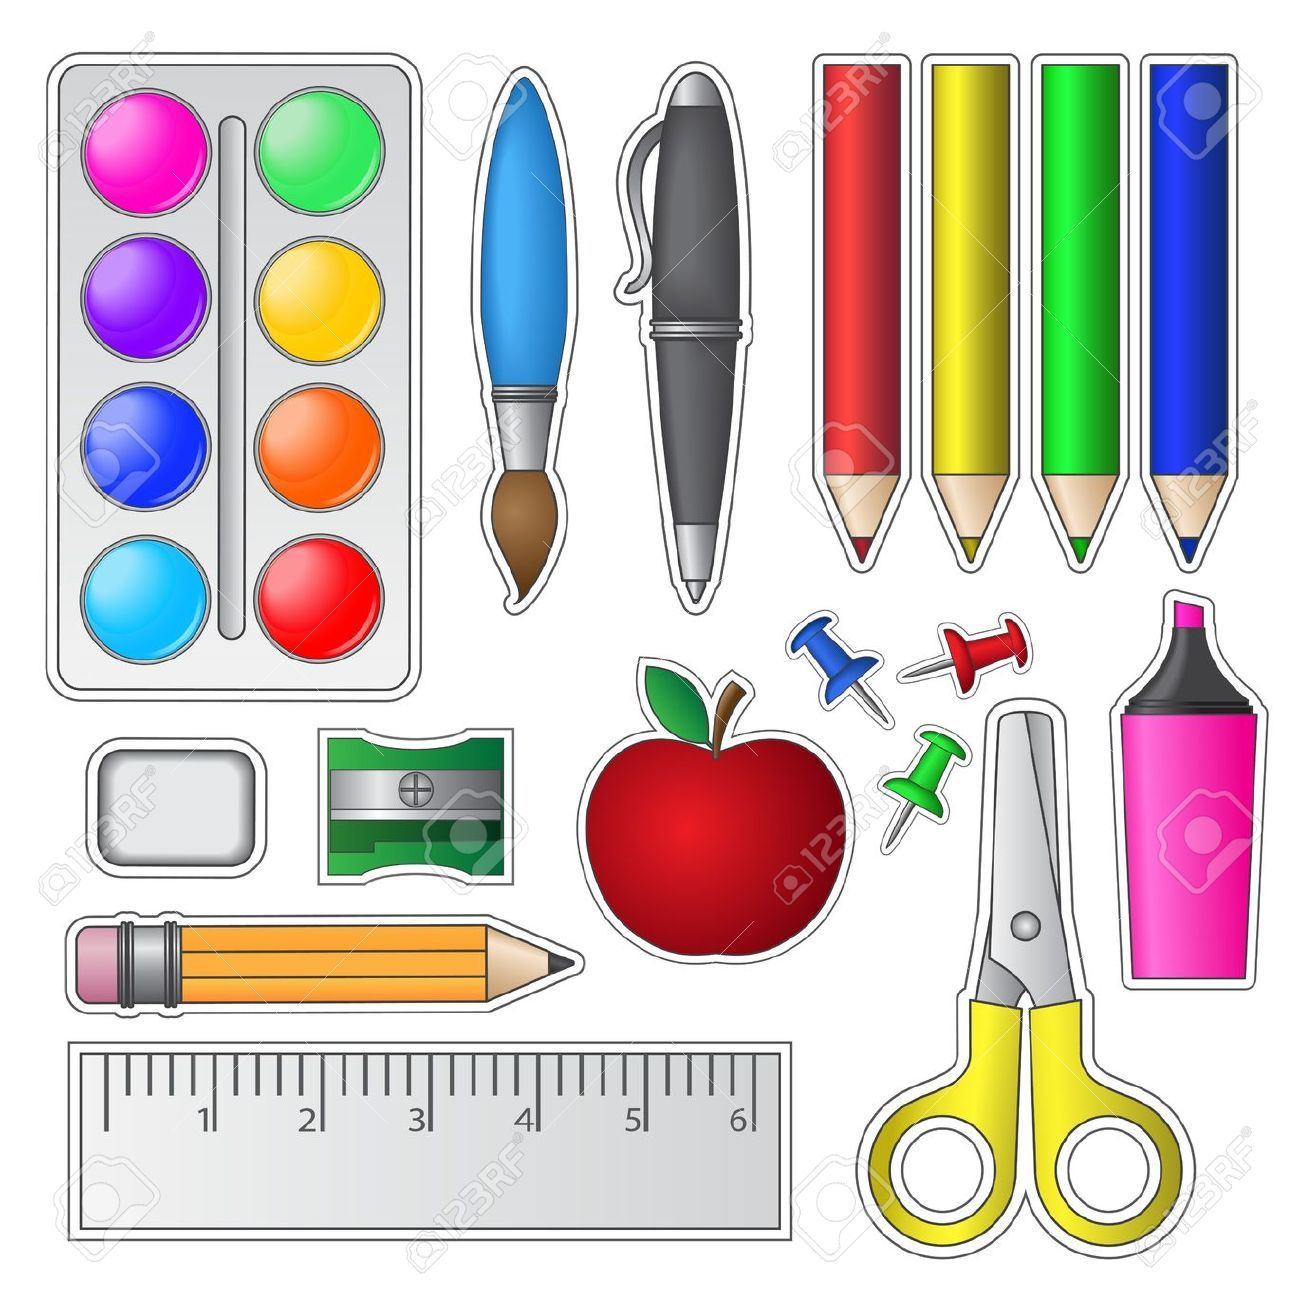 Dibujo Utiles Escolar M S Dibujillos Pinterest